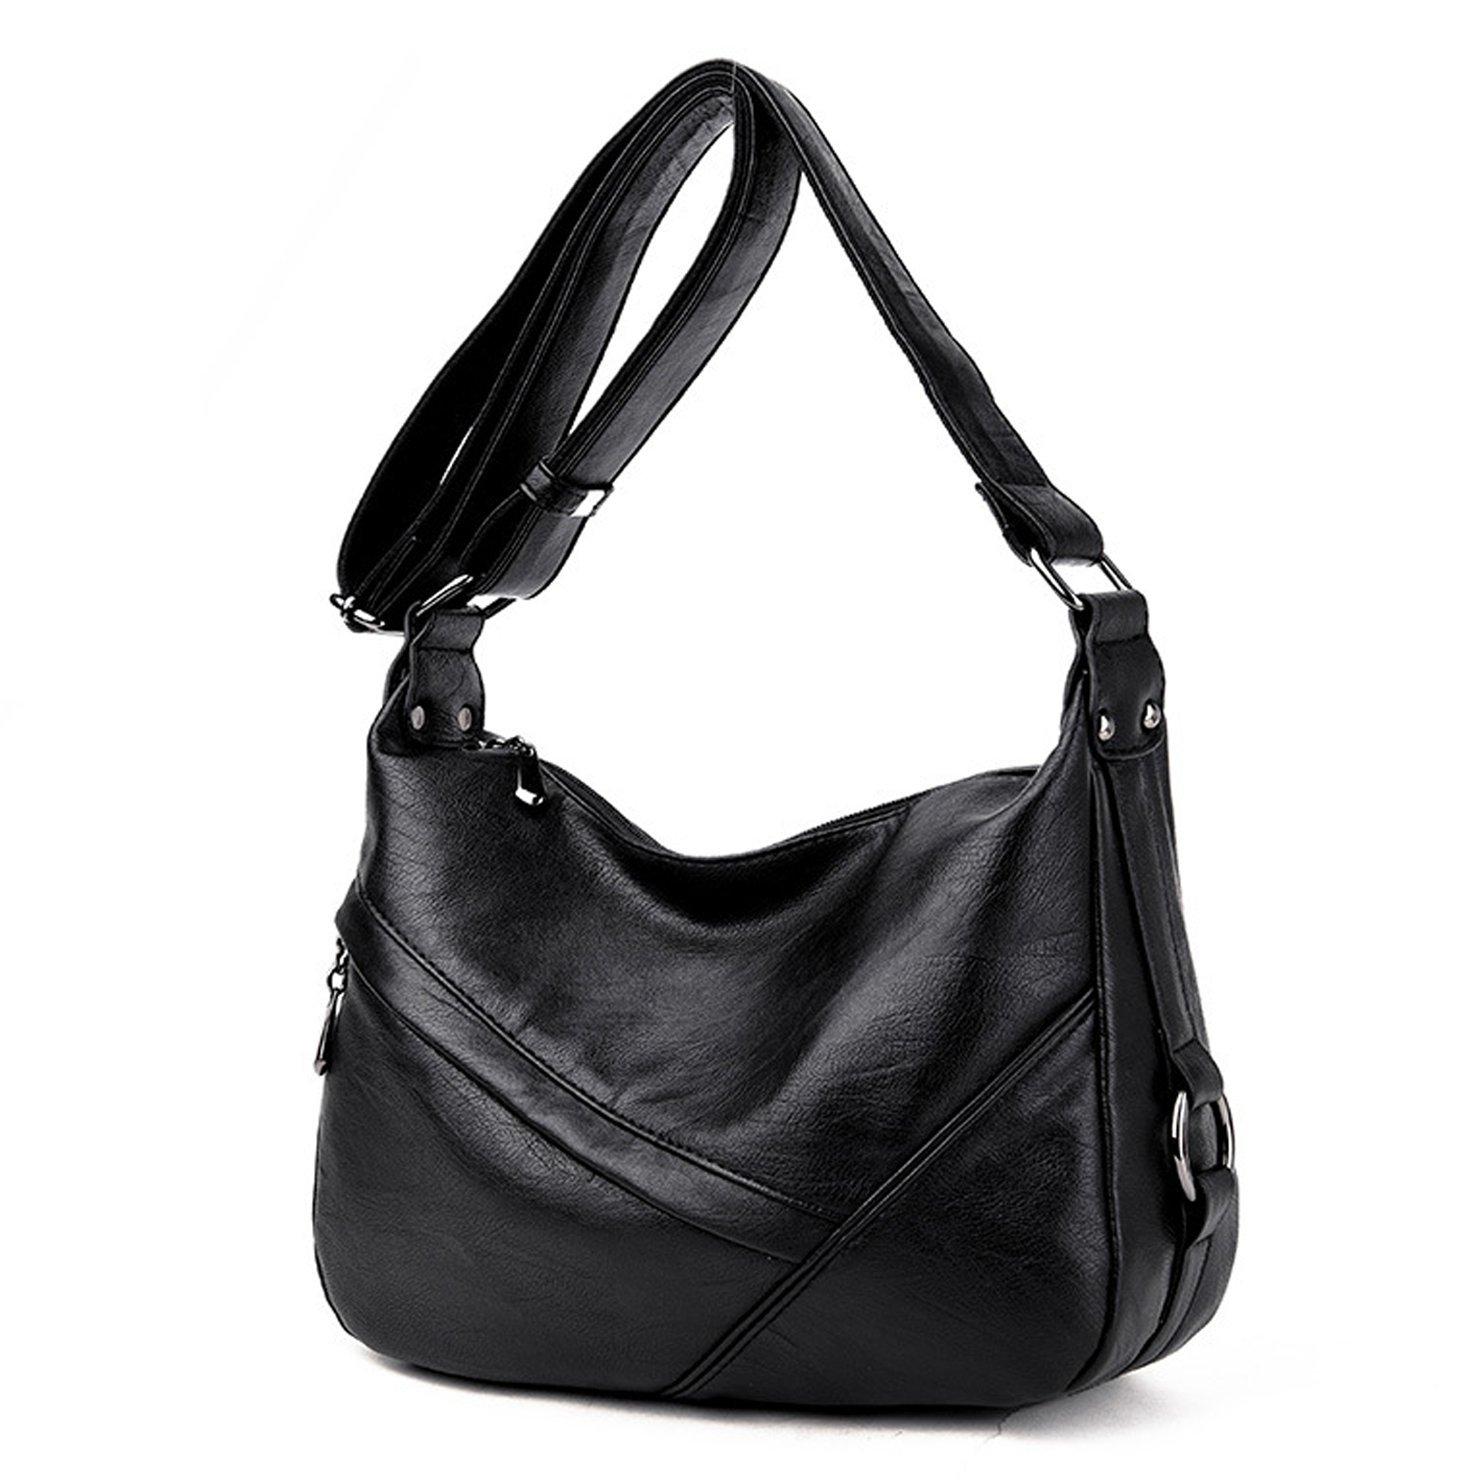 Lustear Ladies Soft Leather Shoulder Bags Hobo Style Bag (Black)